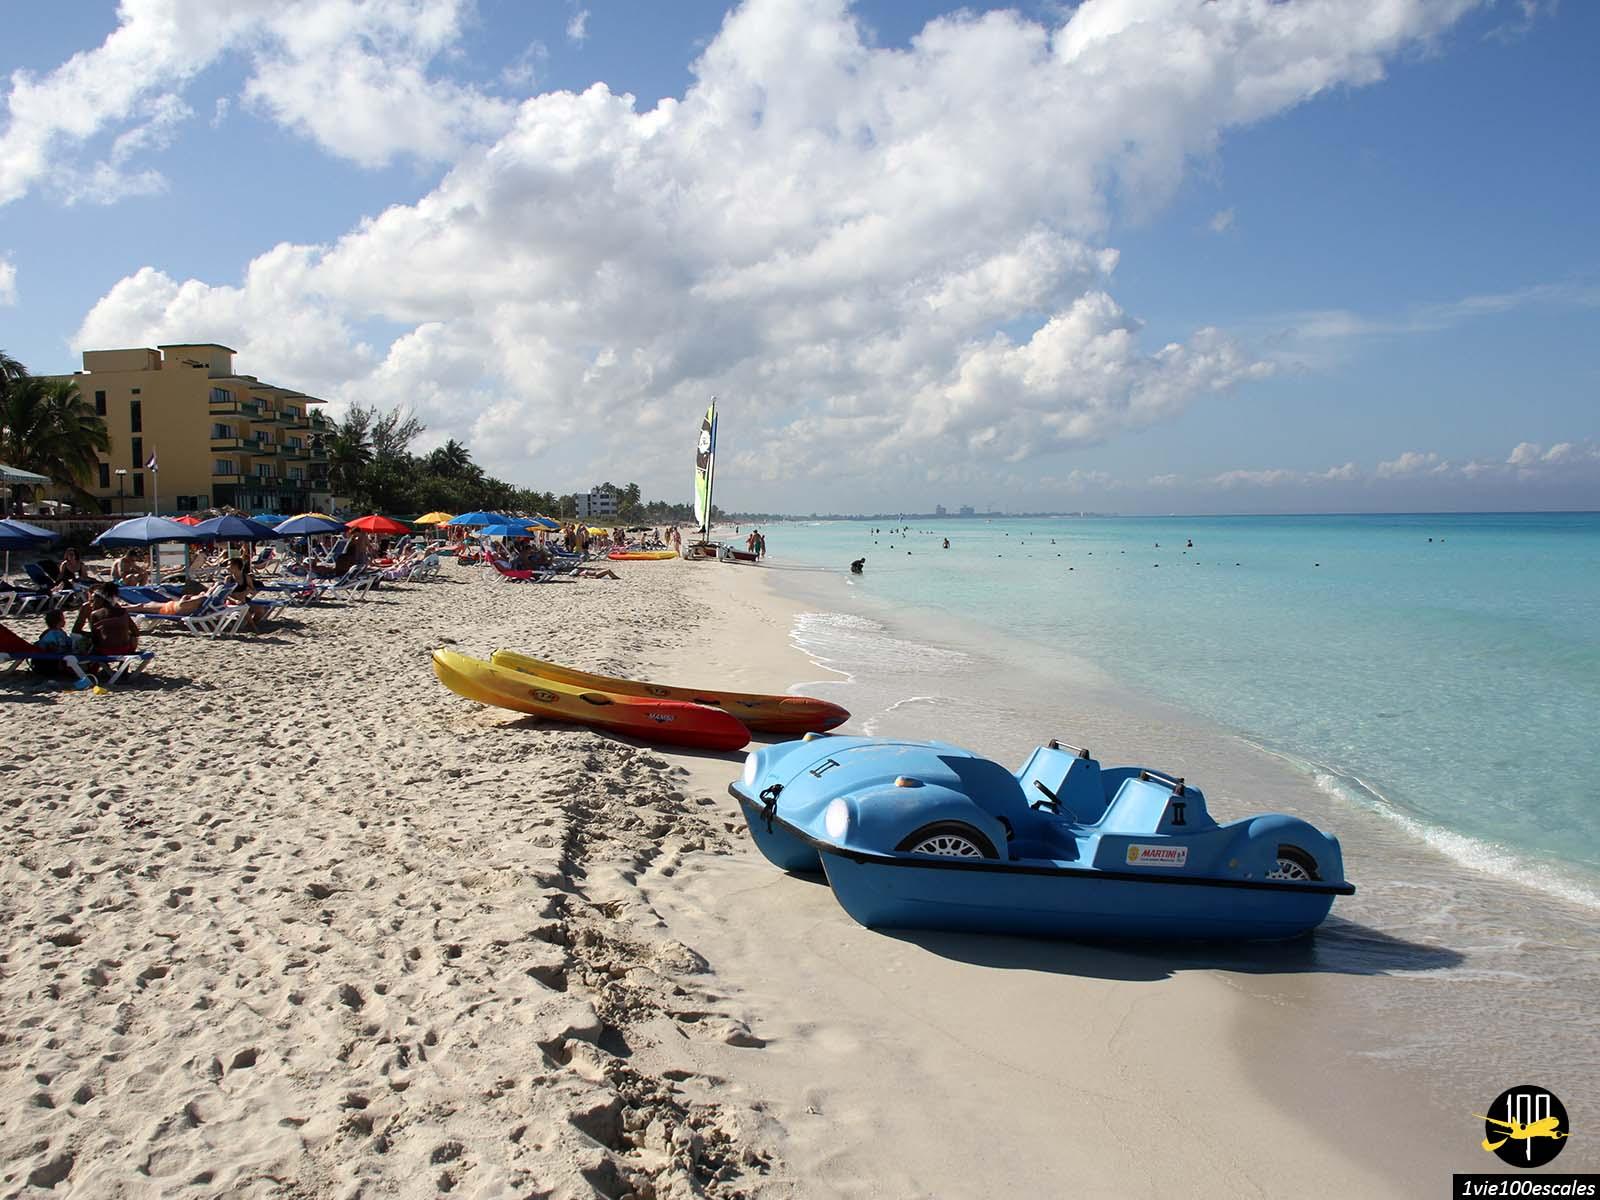 Un petit hotel resort sur la plage de Varadero à Cuba